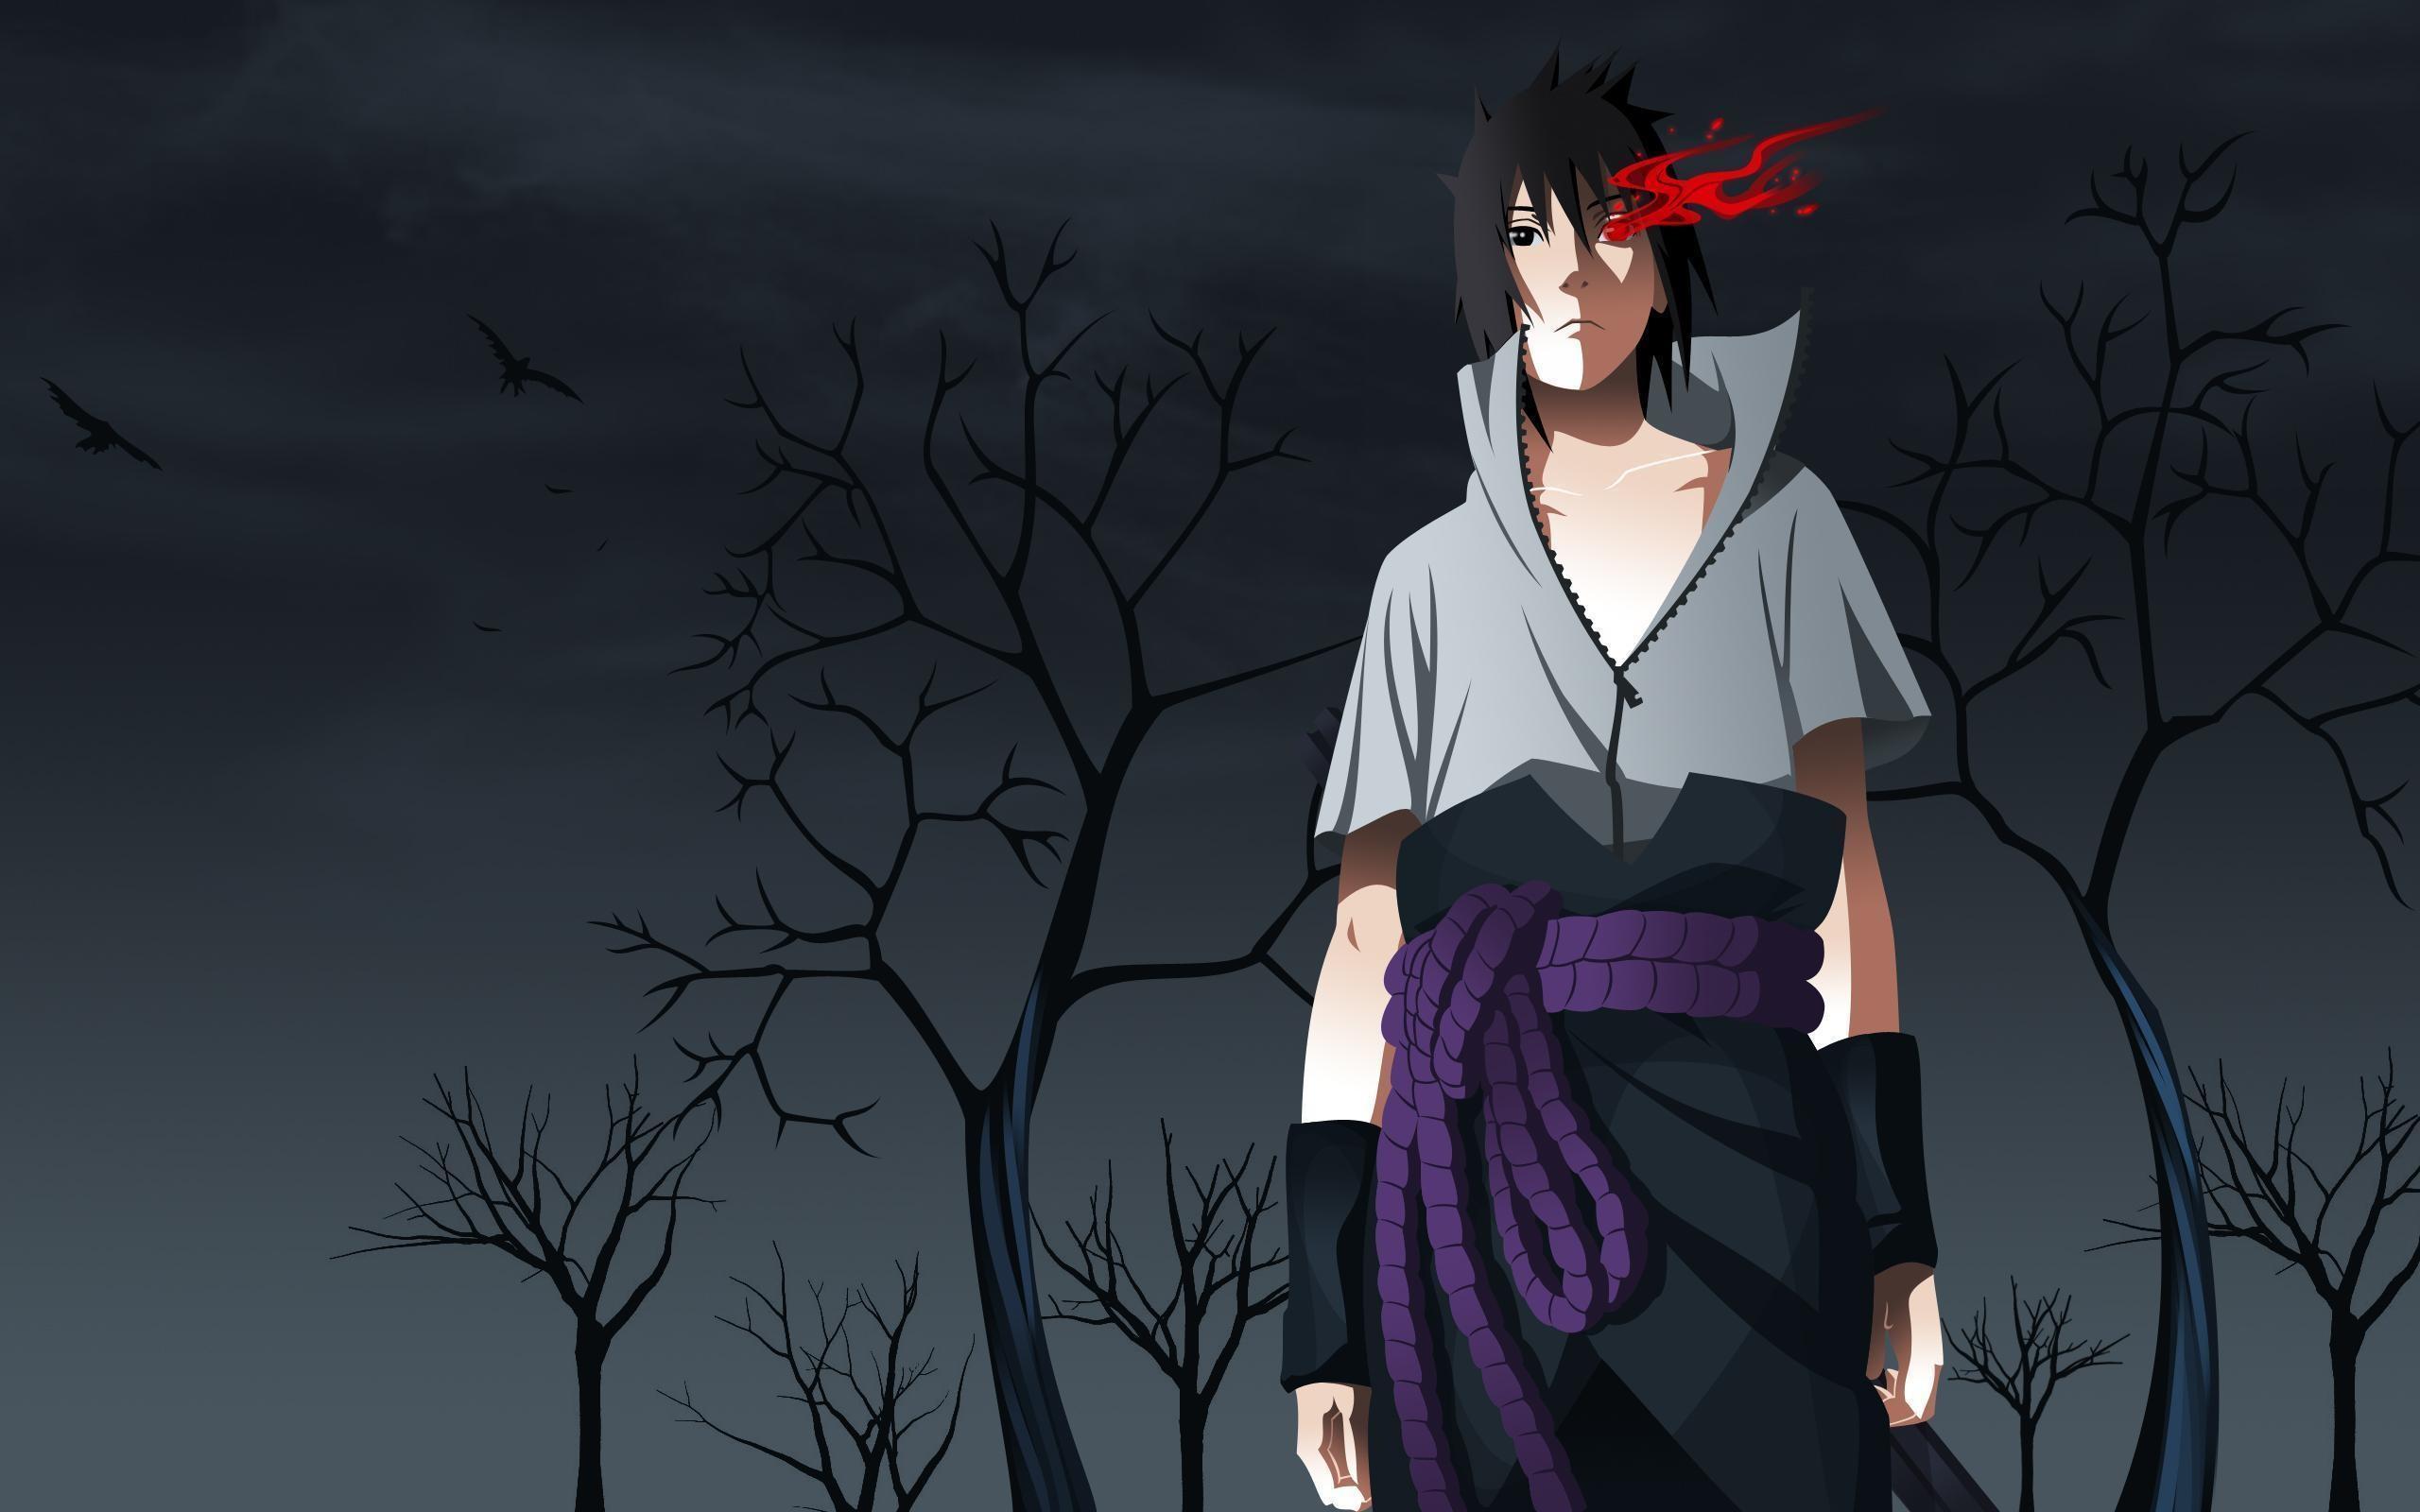 Sasuke Uchiha 14 HD Images Wallpapers   HD Image Wallpaper